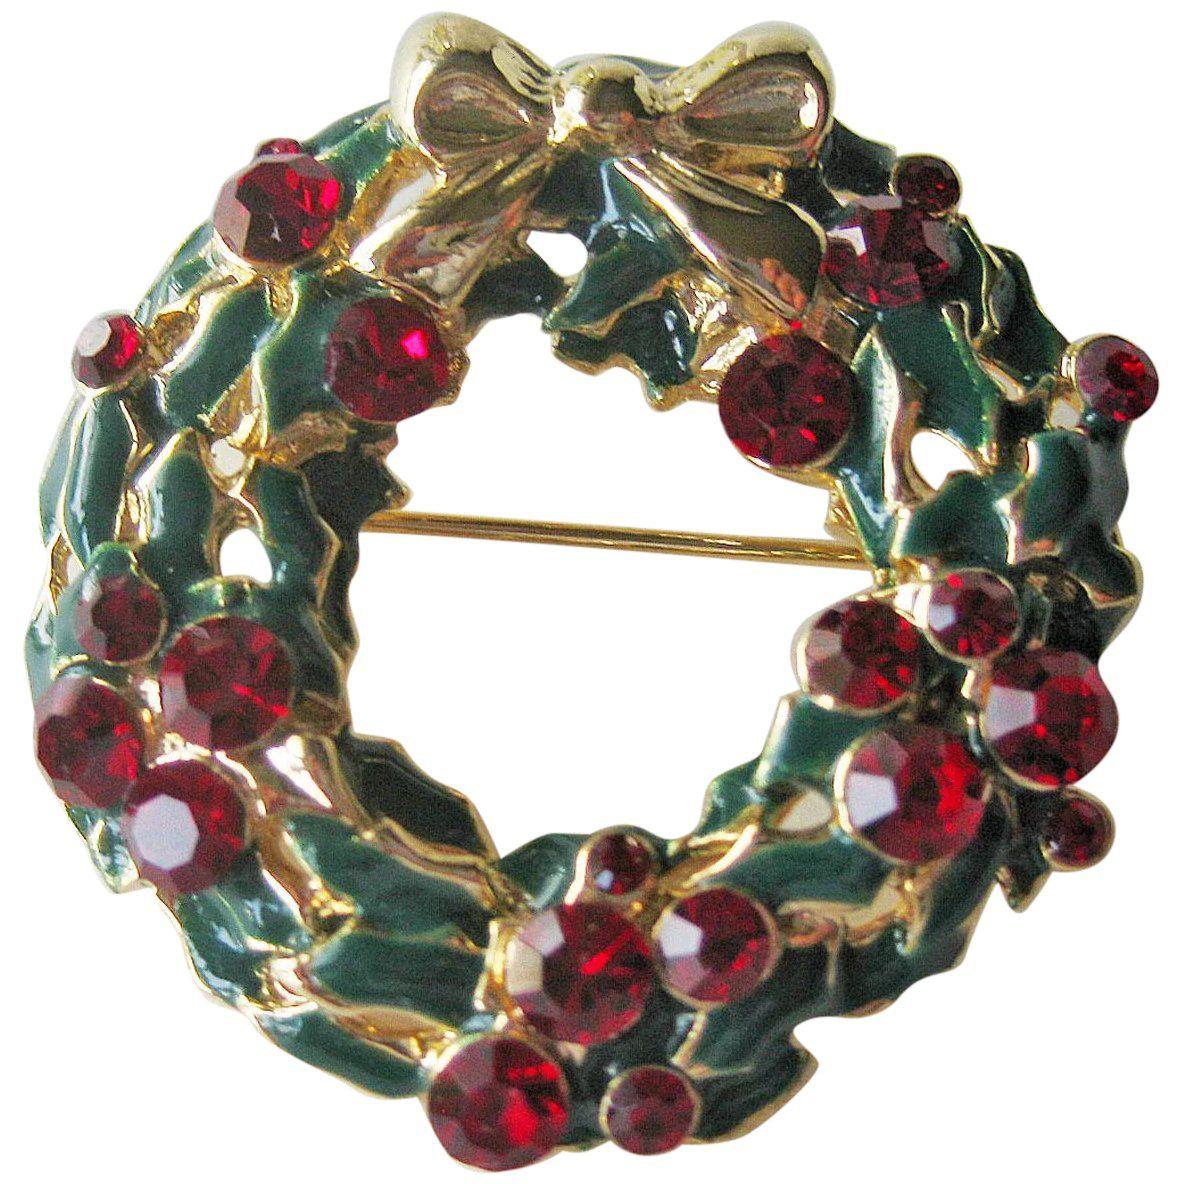 Charm Bracelet Christmas Holiday Jewelry Christmas Typewriter Key Bracelet Antique Typewriter Jewelry Green and Red Bracelet